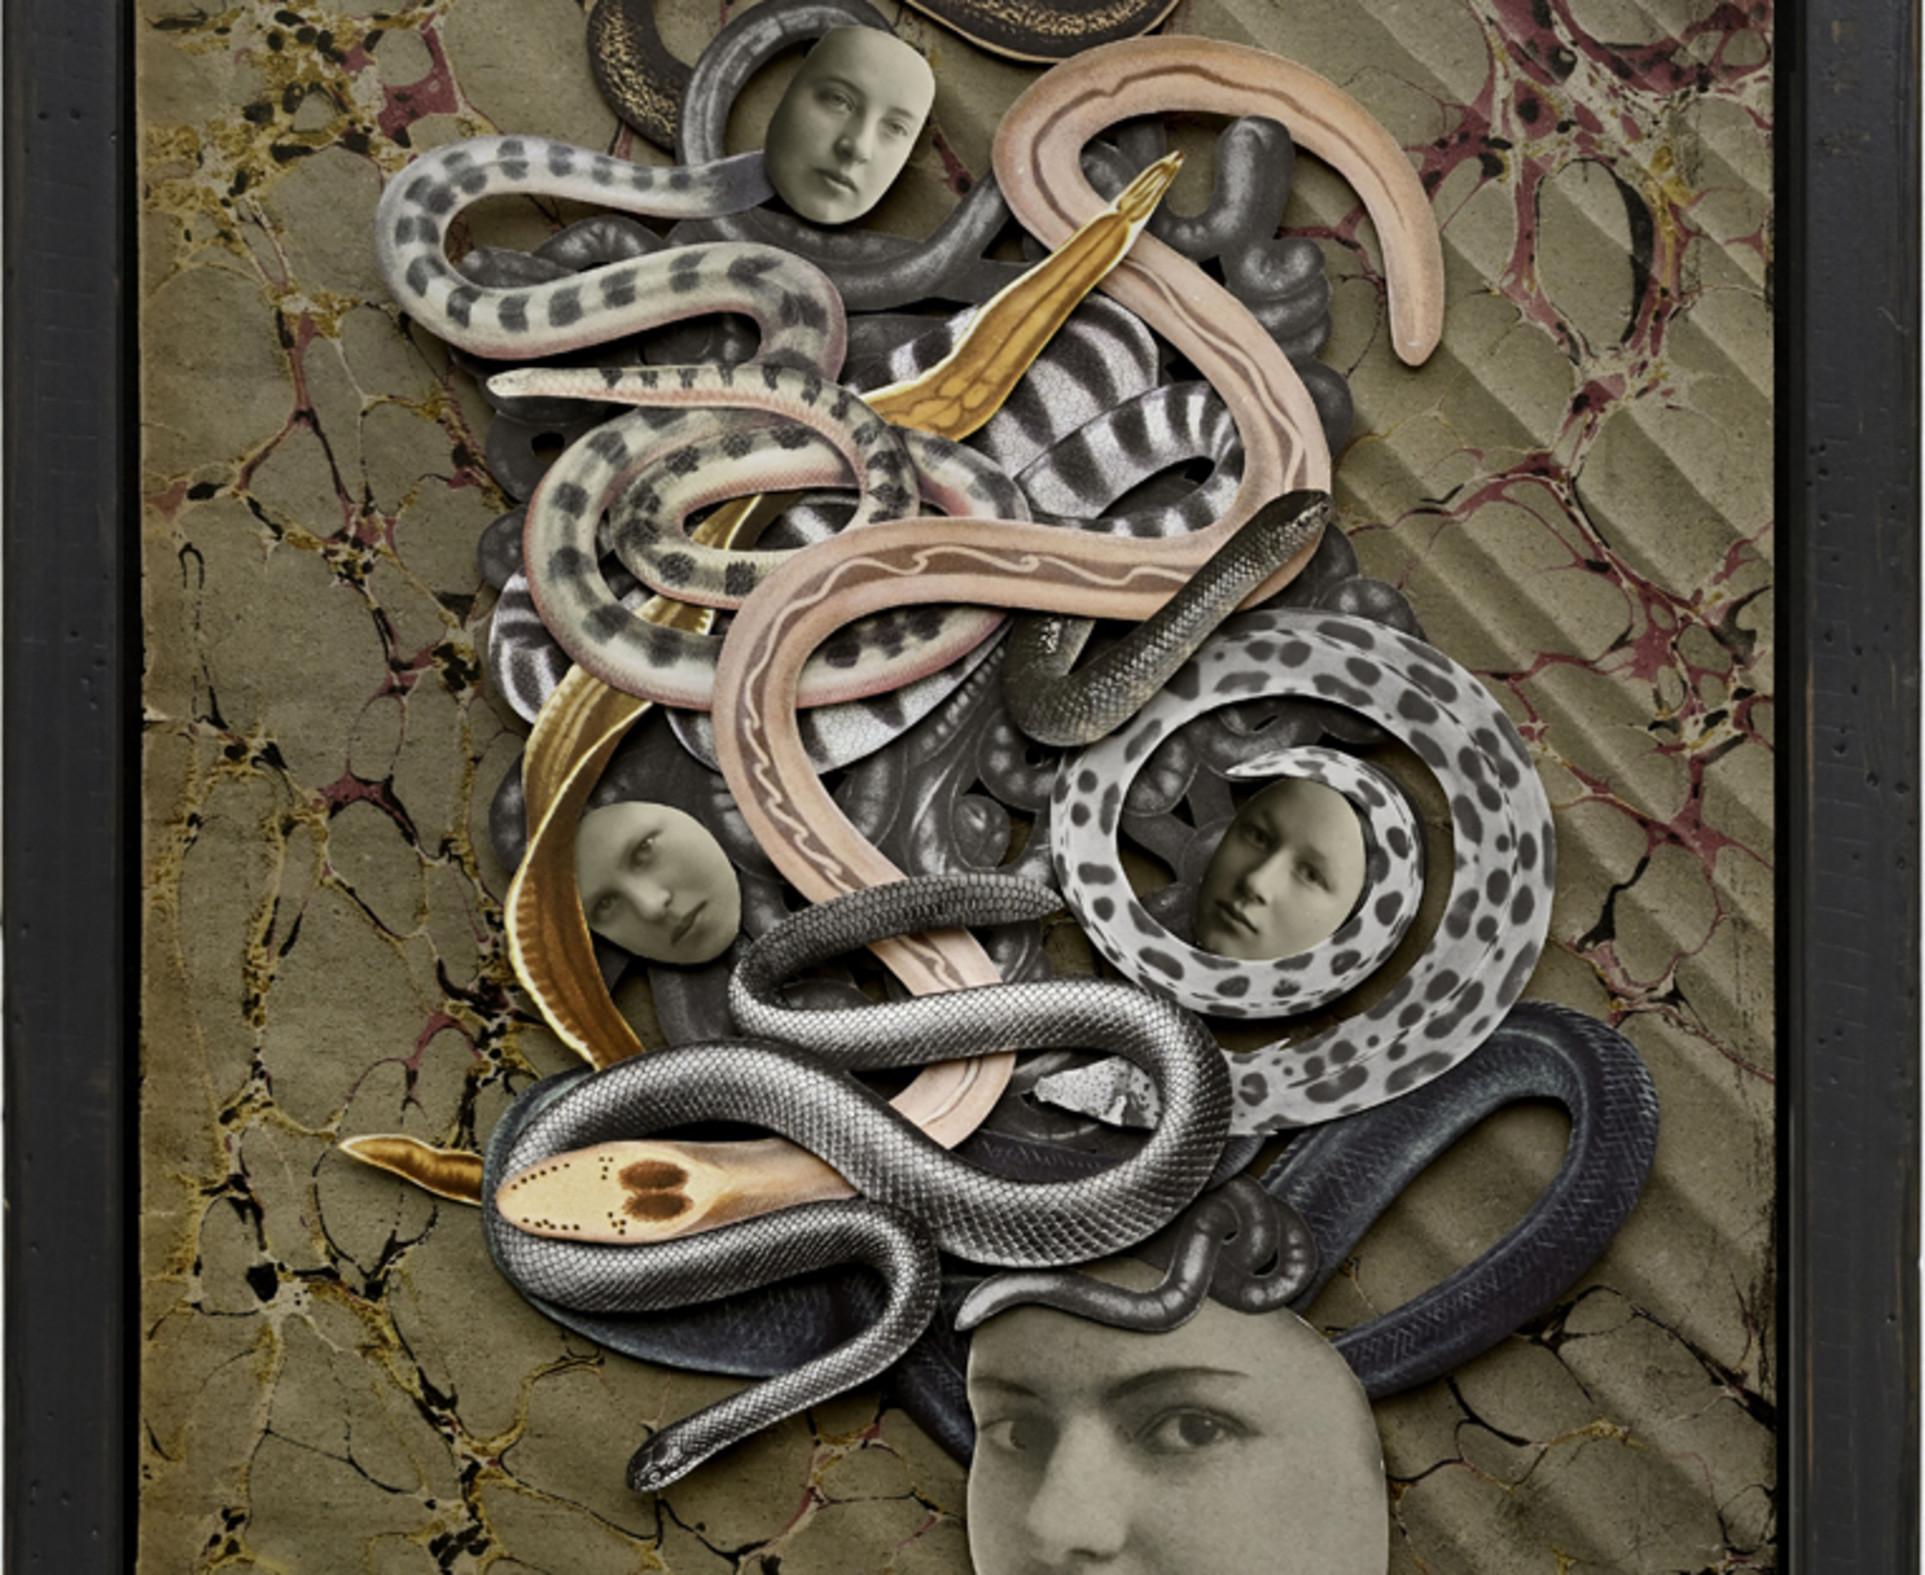 Hope Kroll, Medusa, 2019